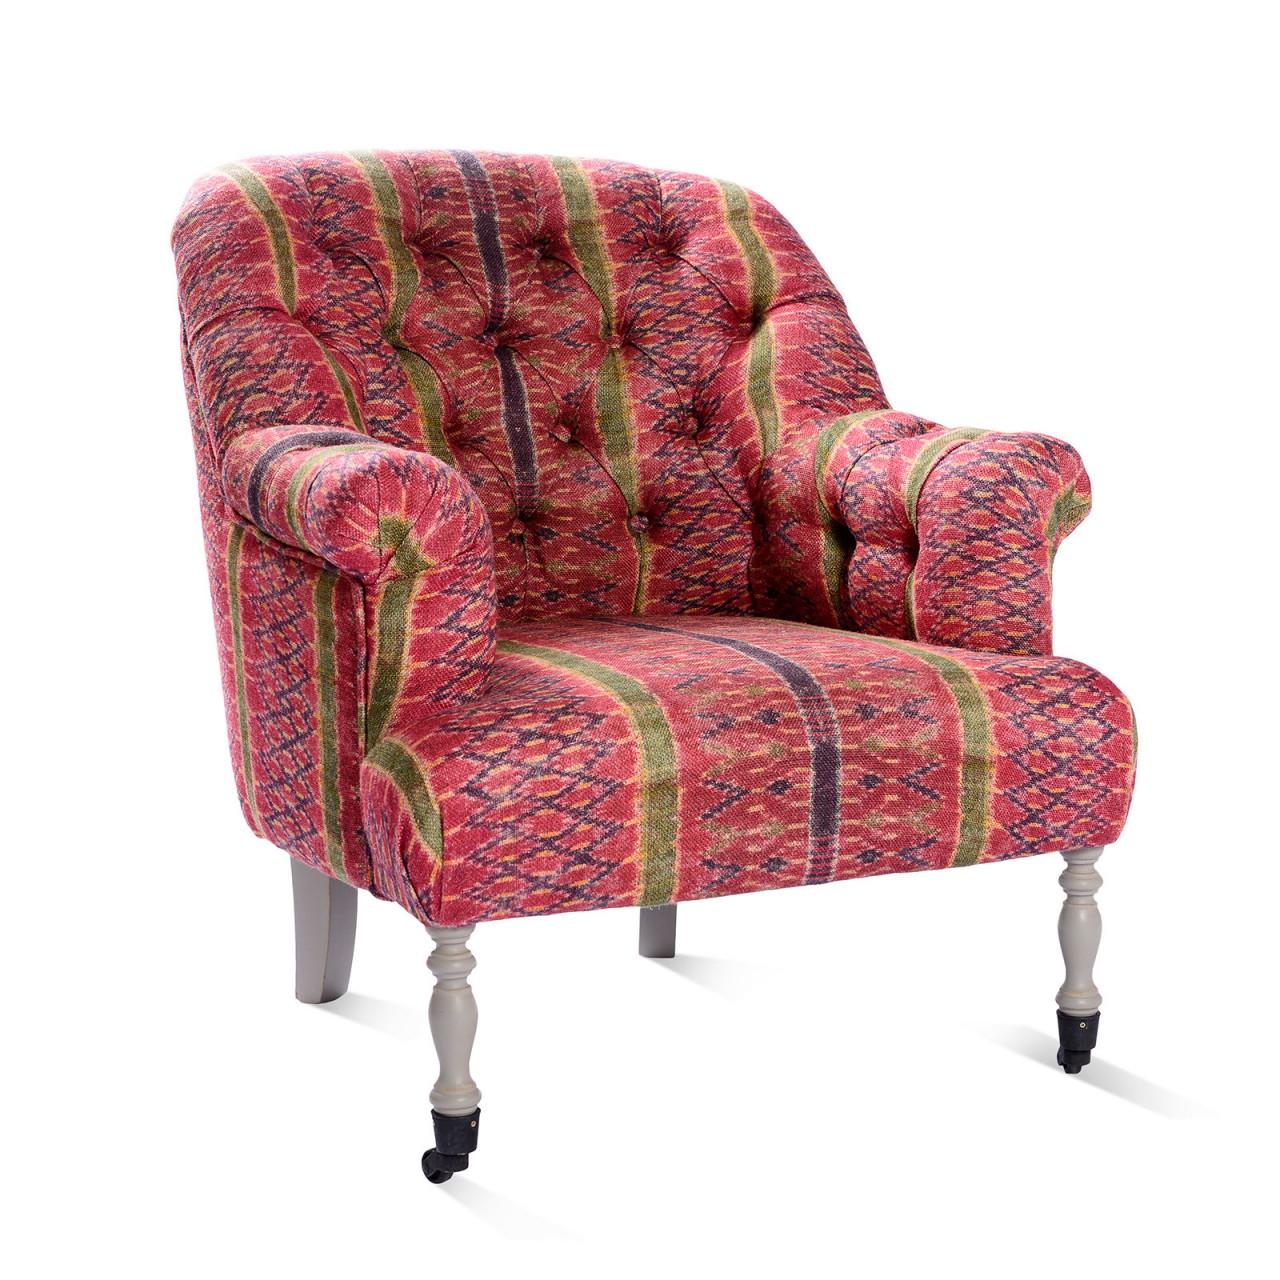 ST GERMAINE Tufted Chair - Lakai Linen